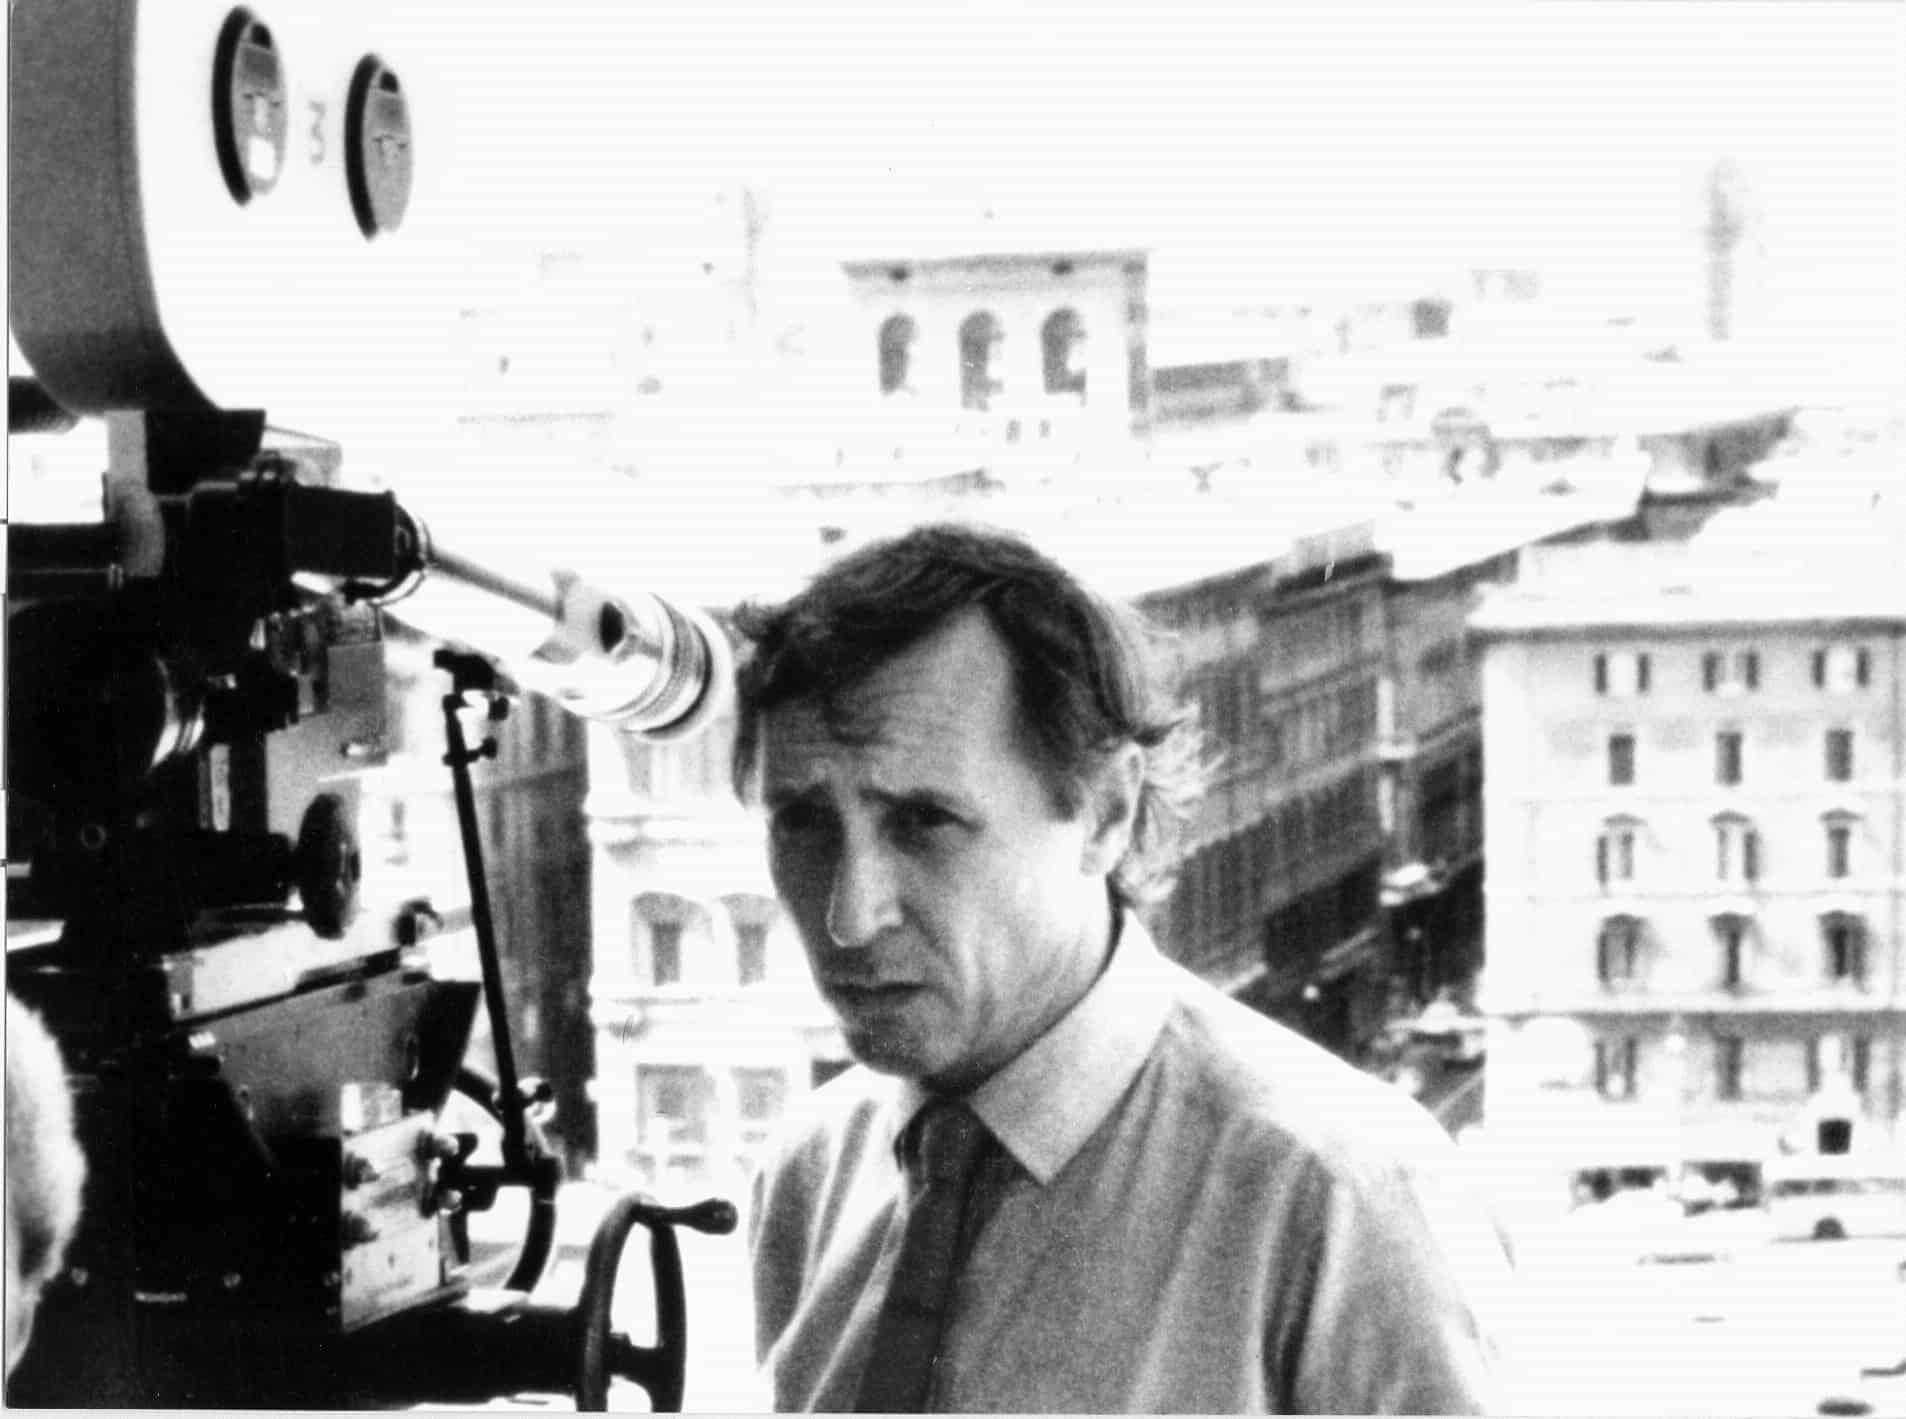 Peter Greenaway, 1987. Rassegna internazionale video d'autore. Taormina.